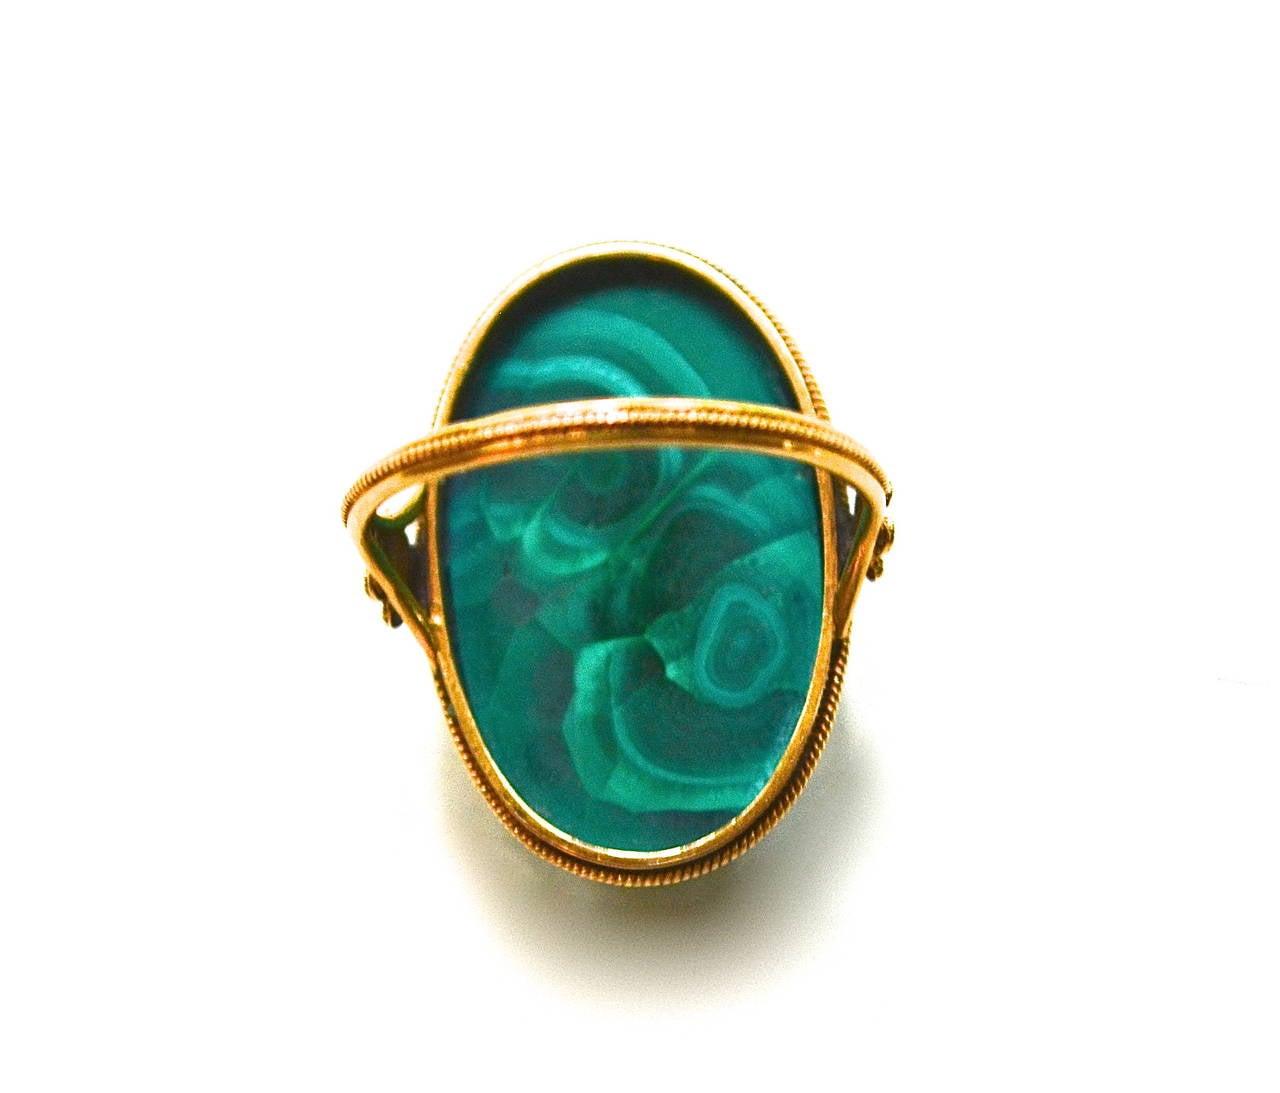 Edwardian 18K Gold Malachite Ring 3